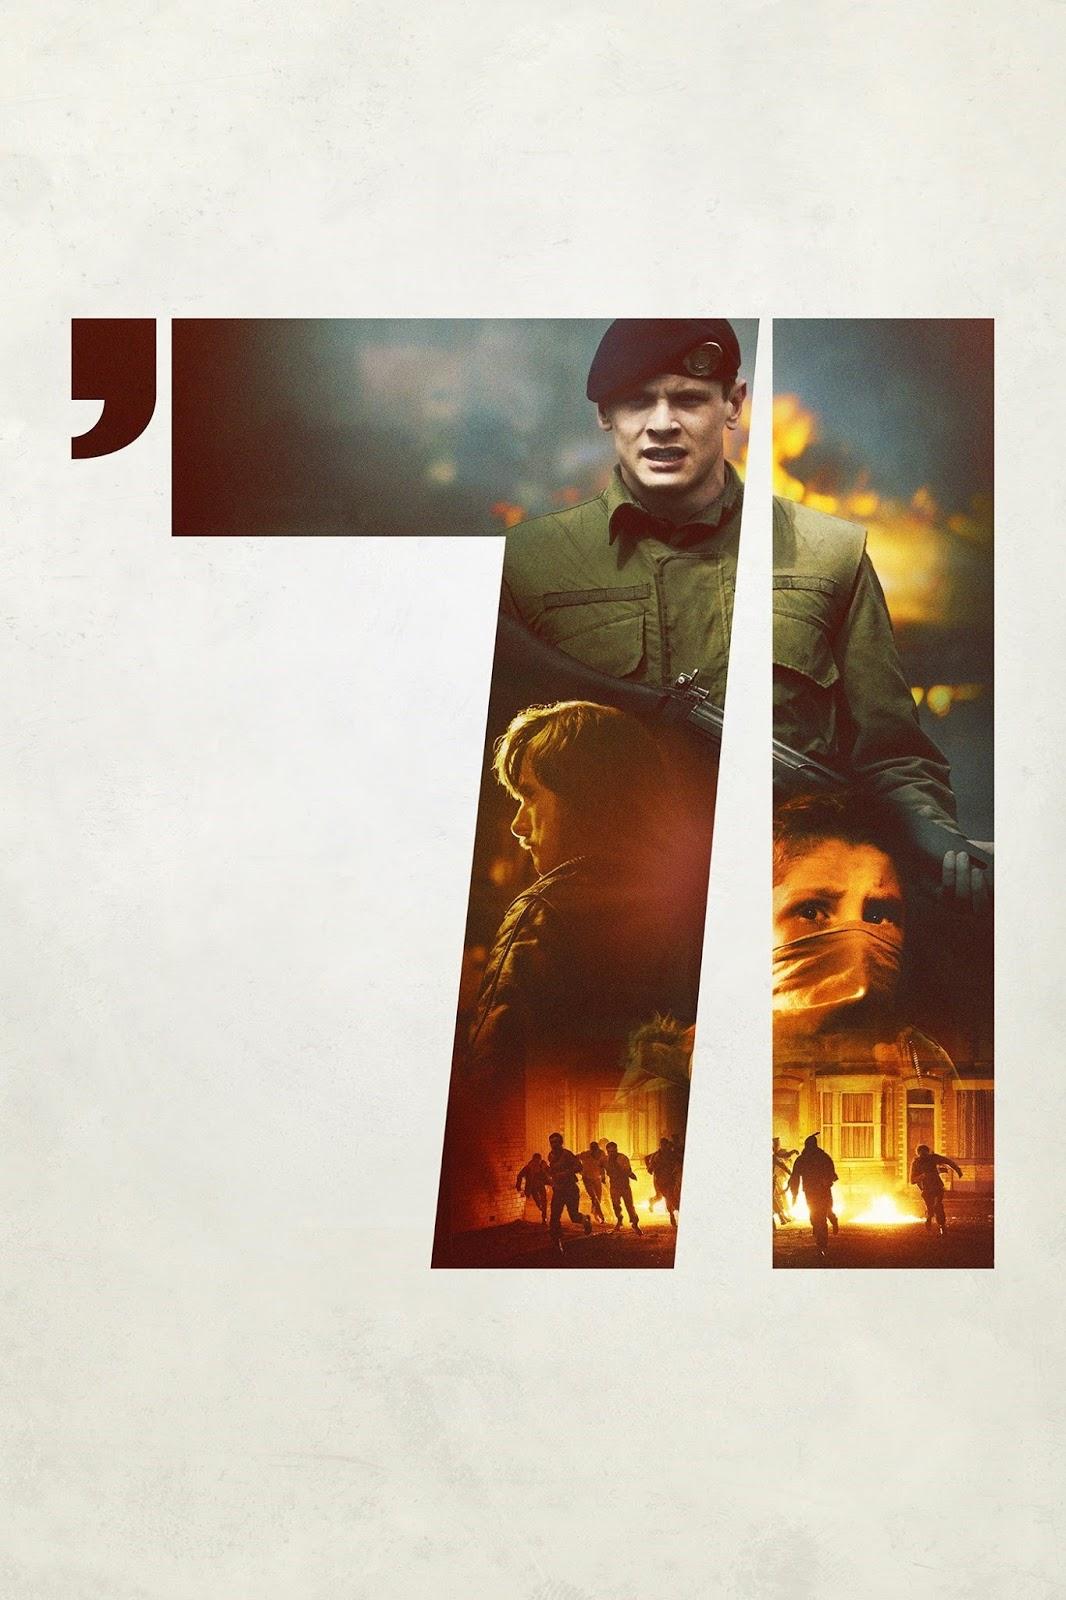 Download Film Barat Terbaru - 71 (2014) Subtitle Indonesia